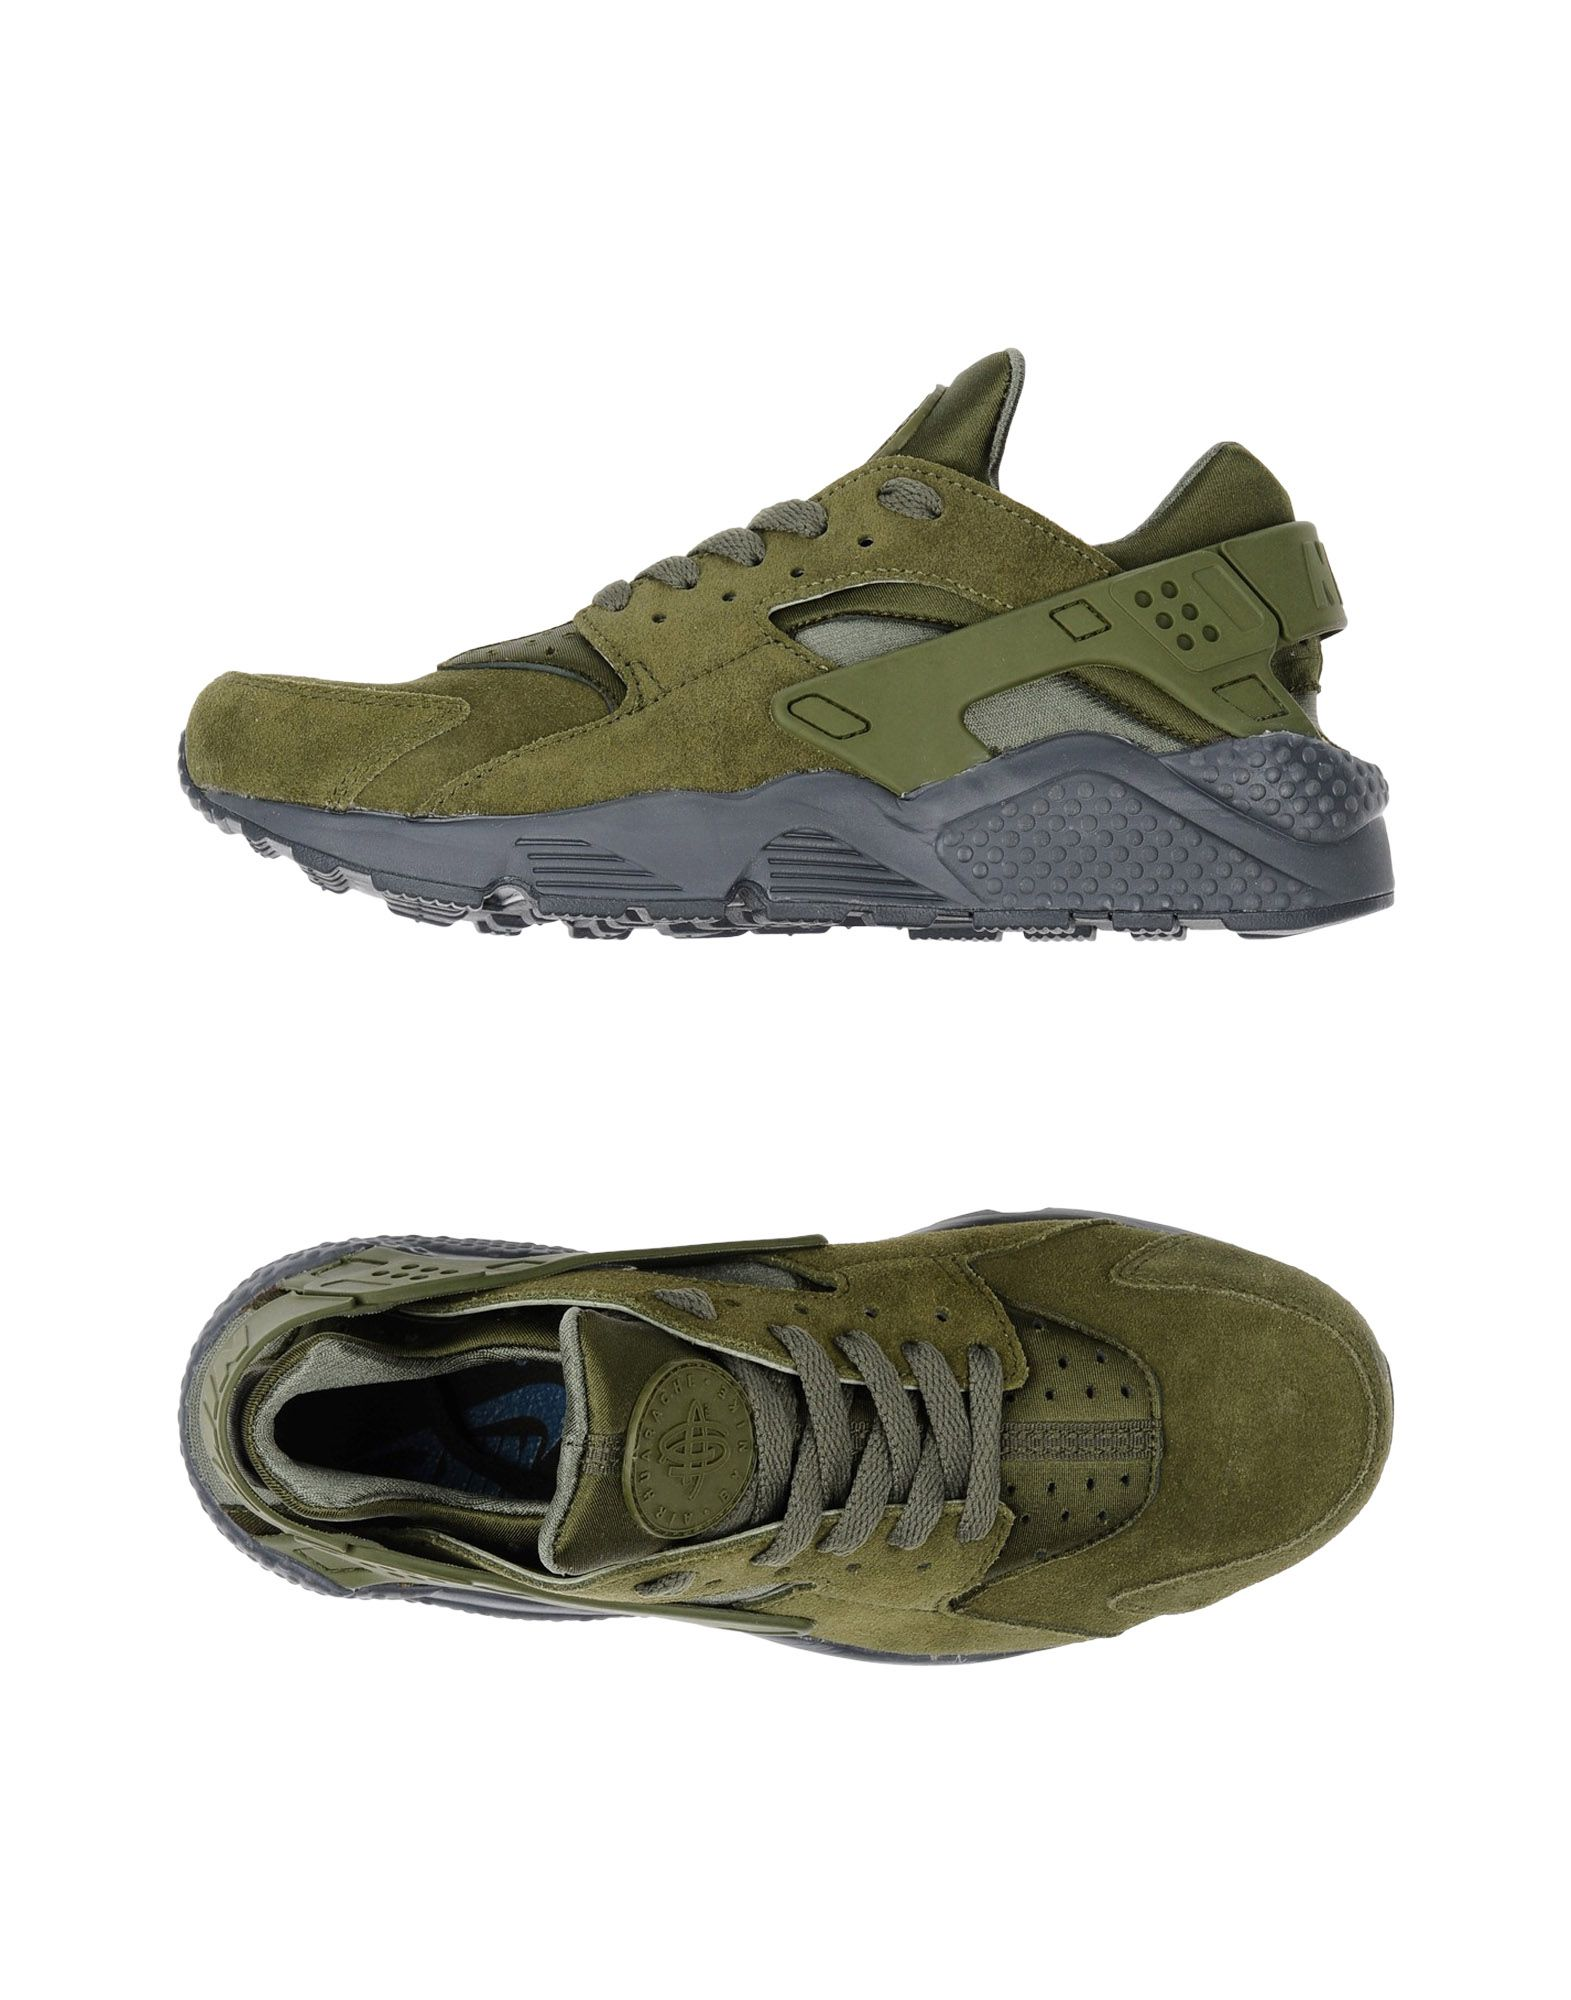 Moda Sneakers Nike Uomo - 11335561DQ